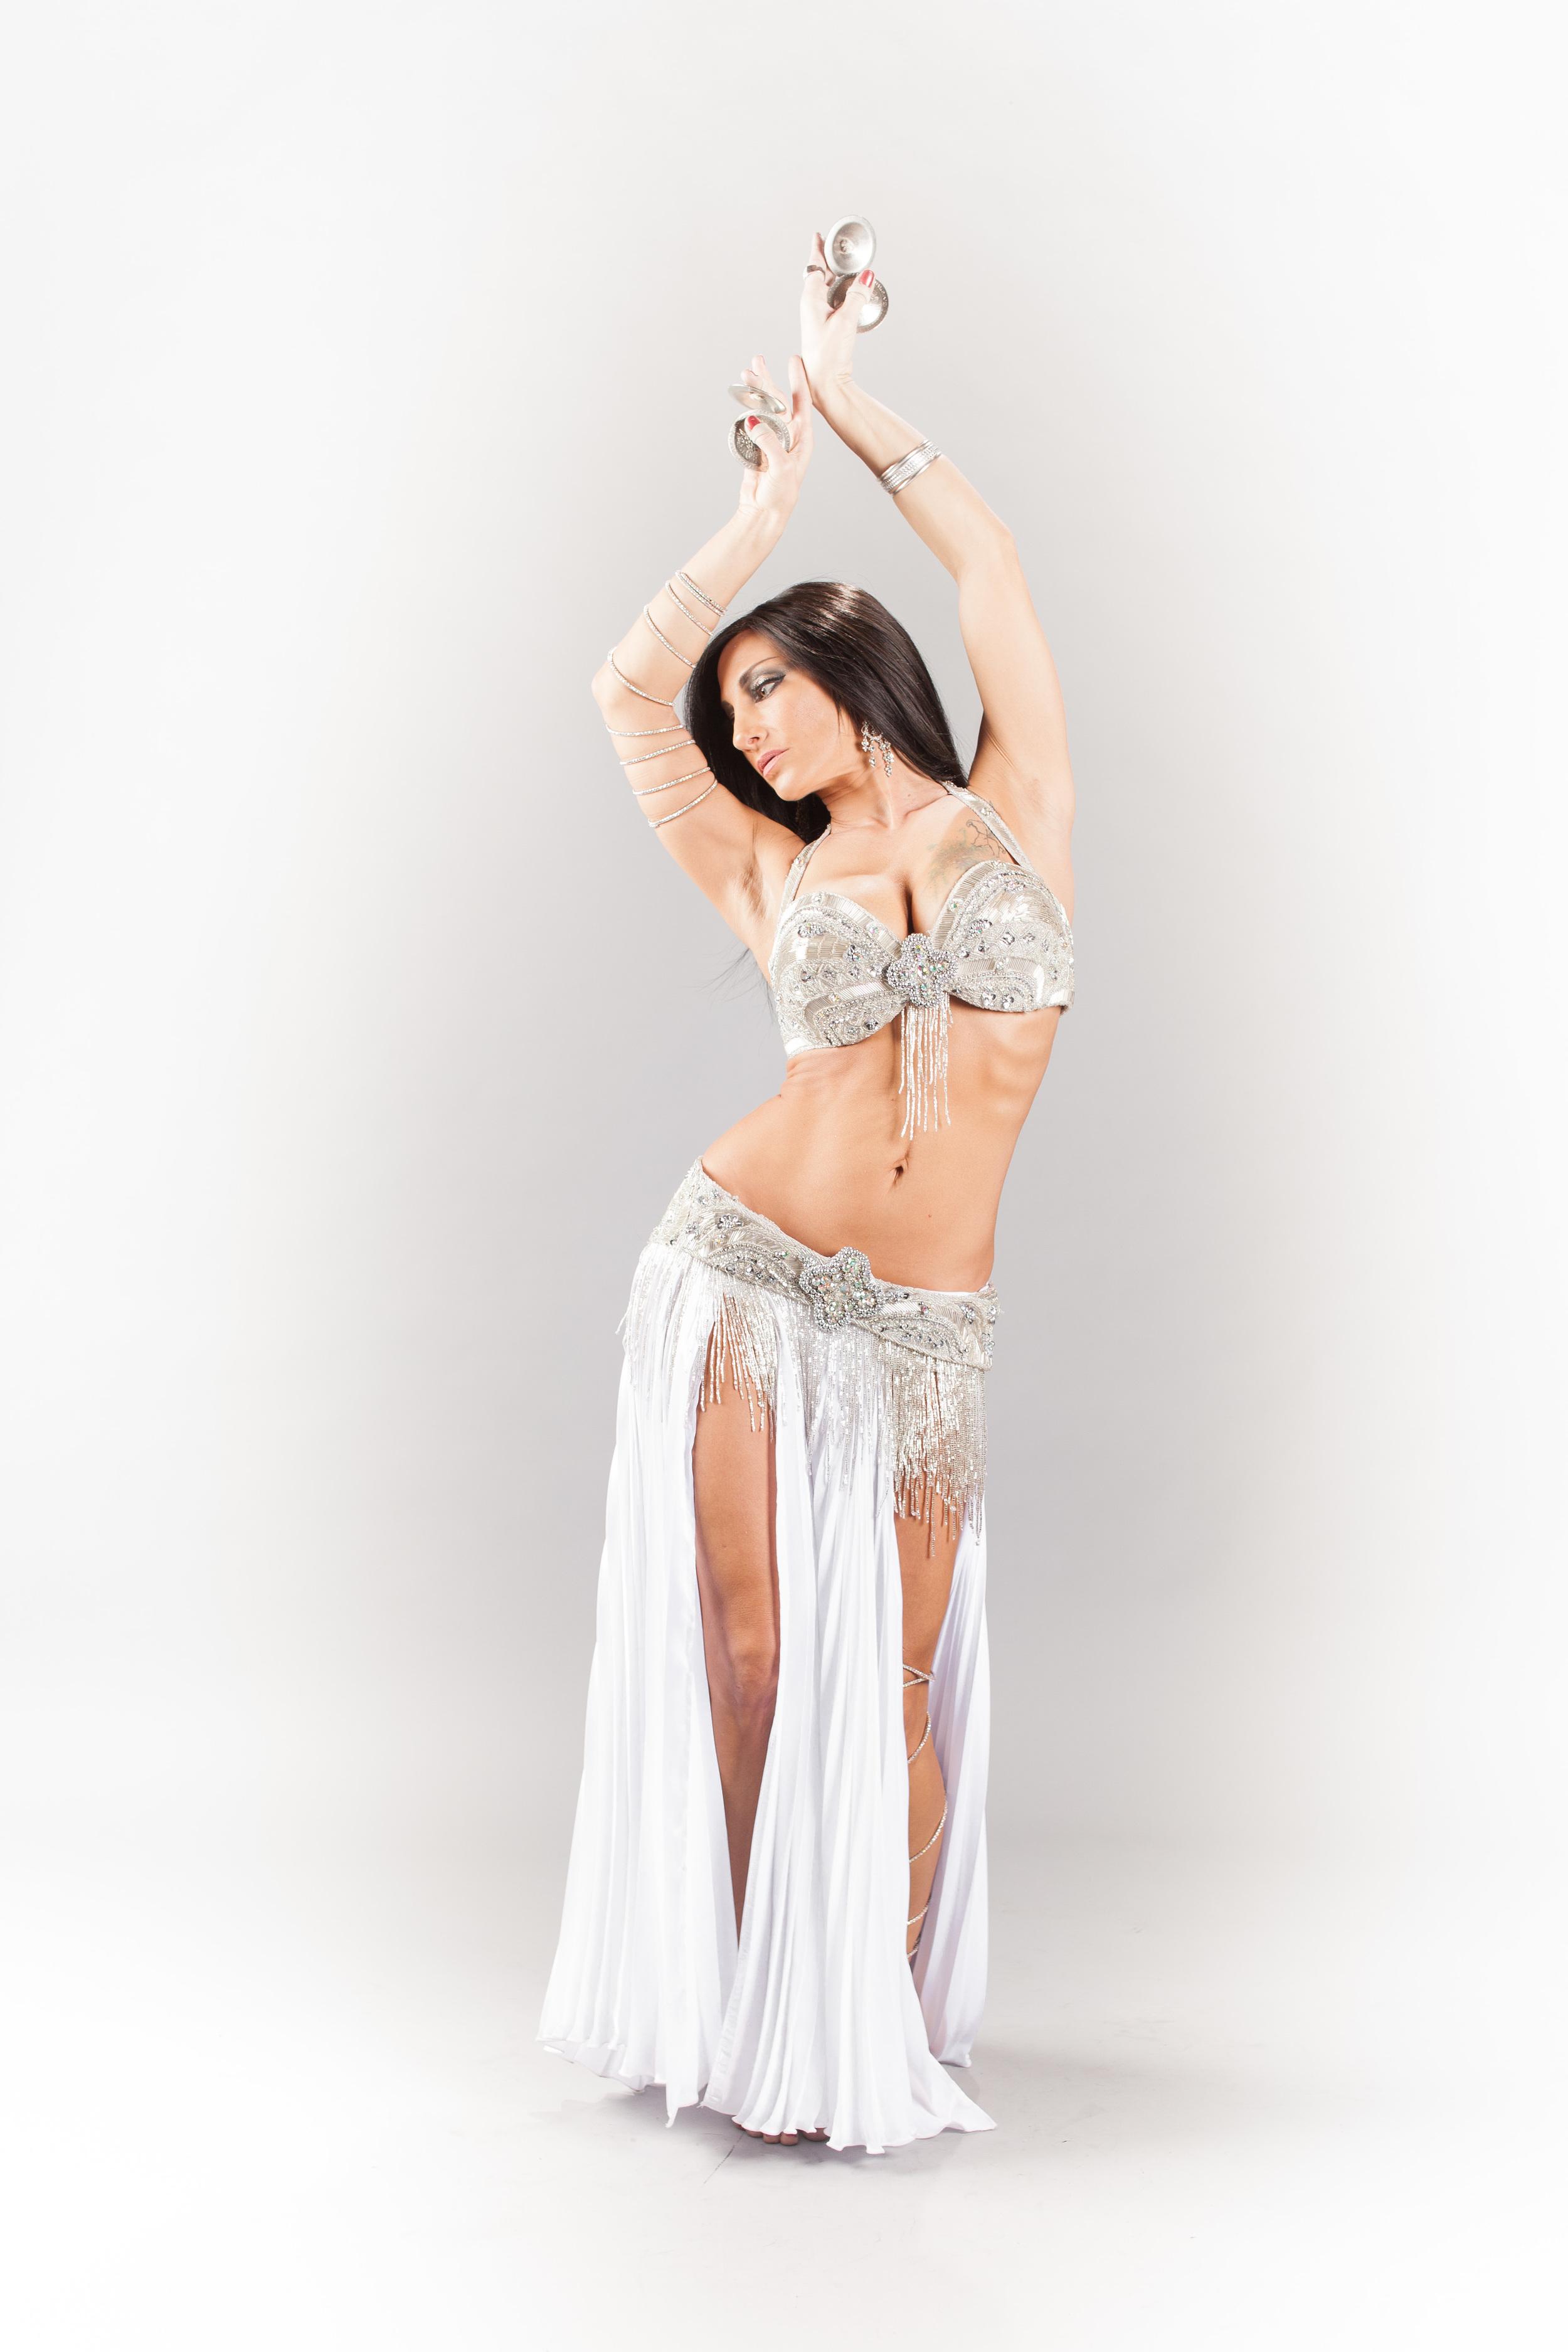 Mahsati Dancer unitymike photo (3 of 235).jpg